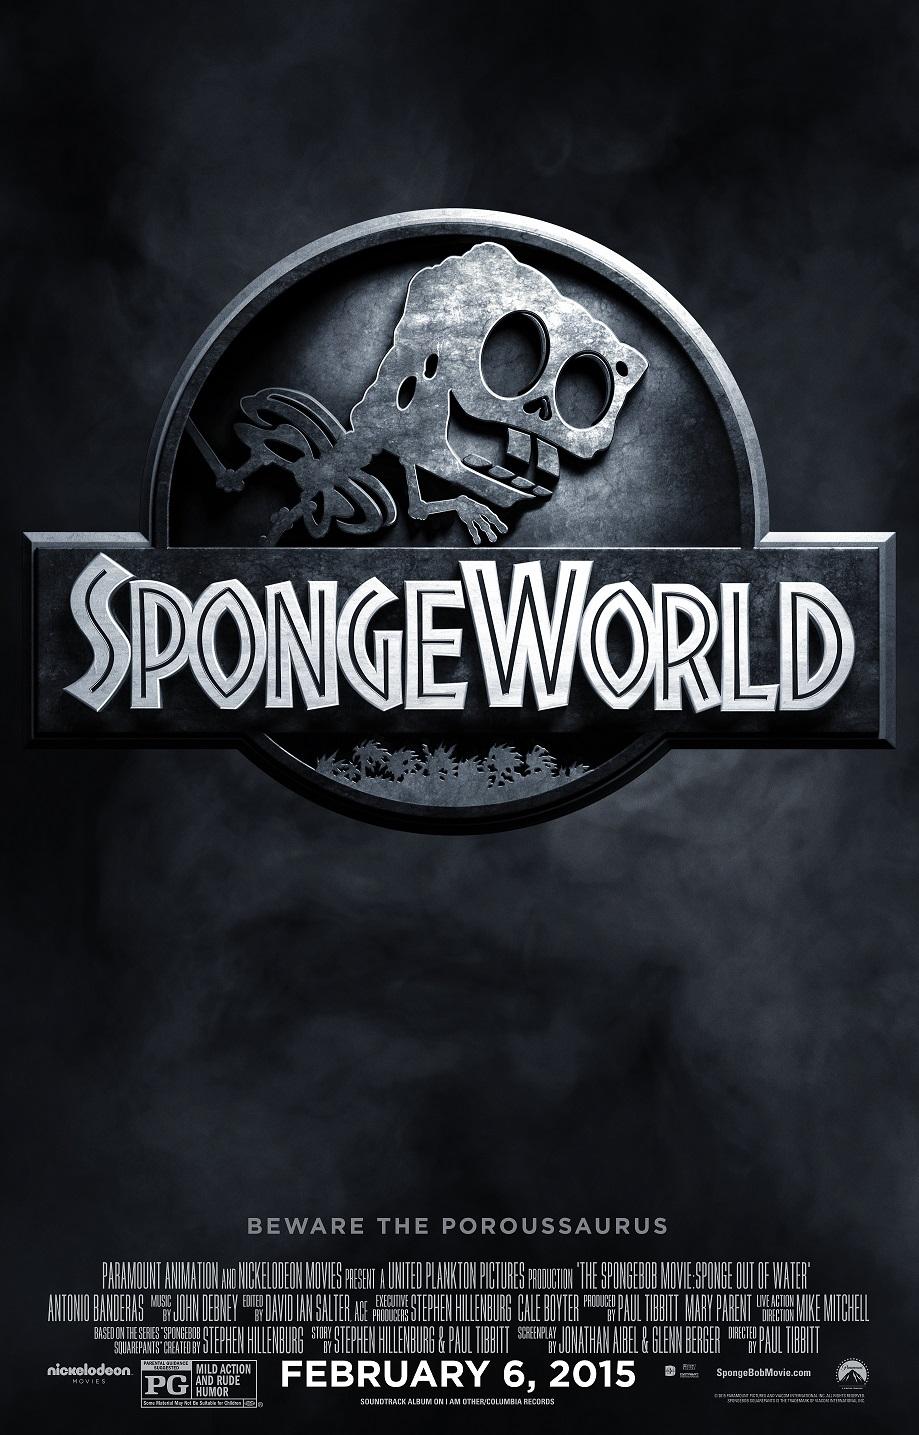 SpongeBob Jurassic World